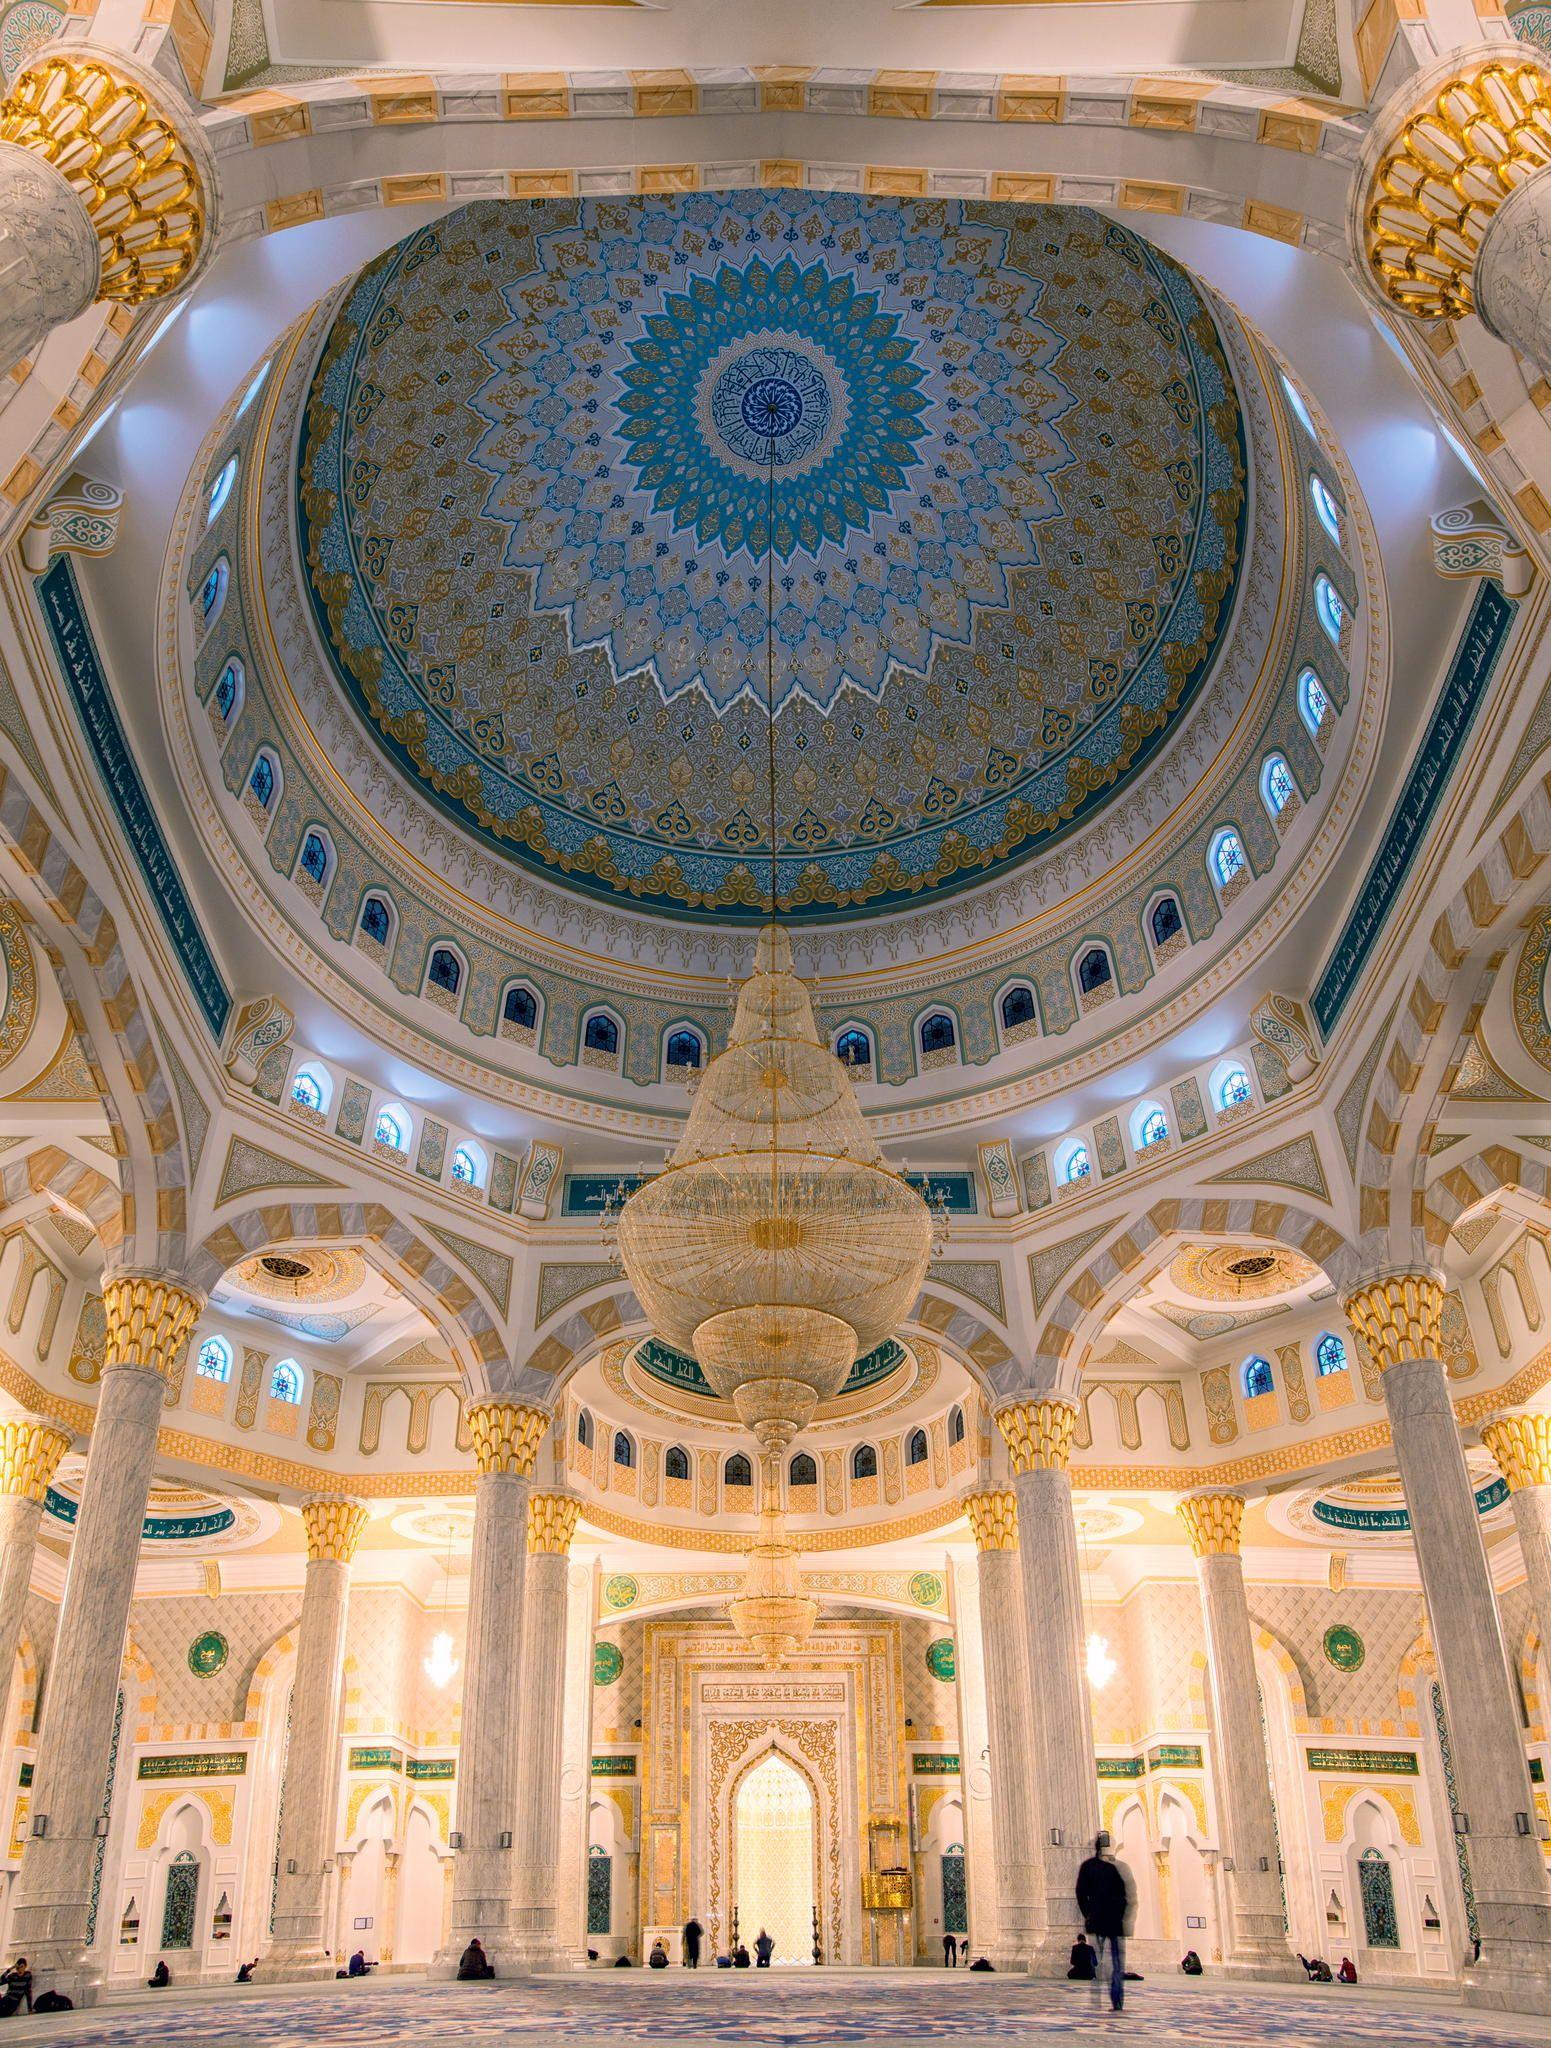 Khazret Sultan Mosque Astana Kazakhstan Islamic Architecture Beautiful Mosques Architecture